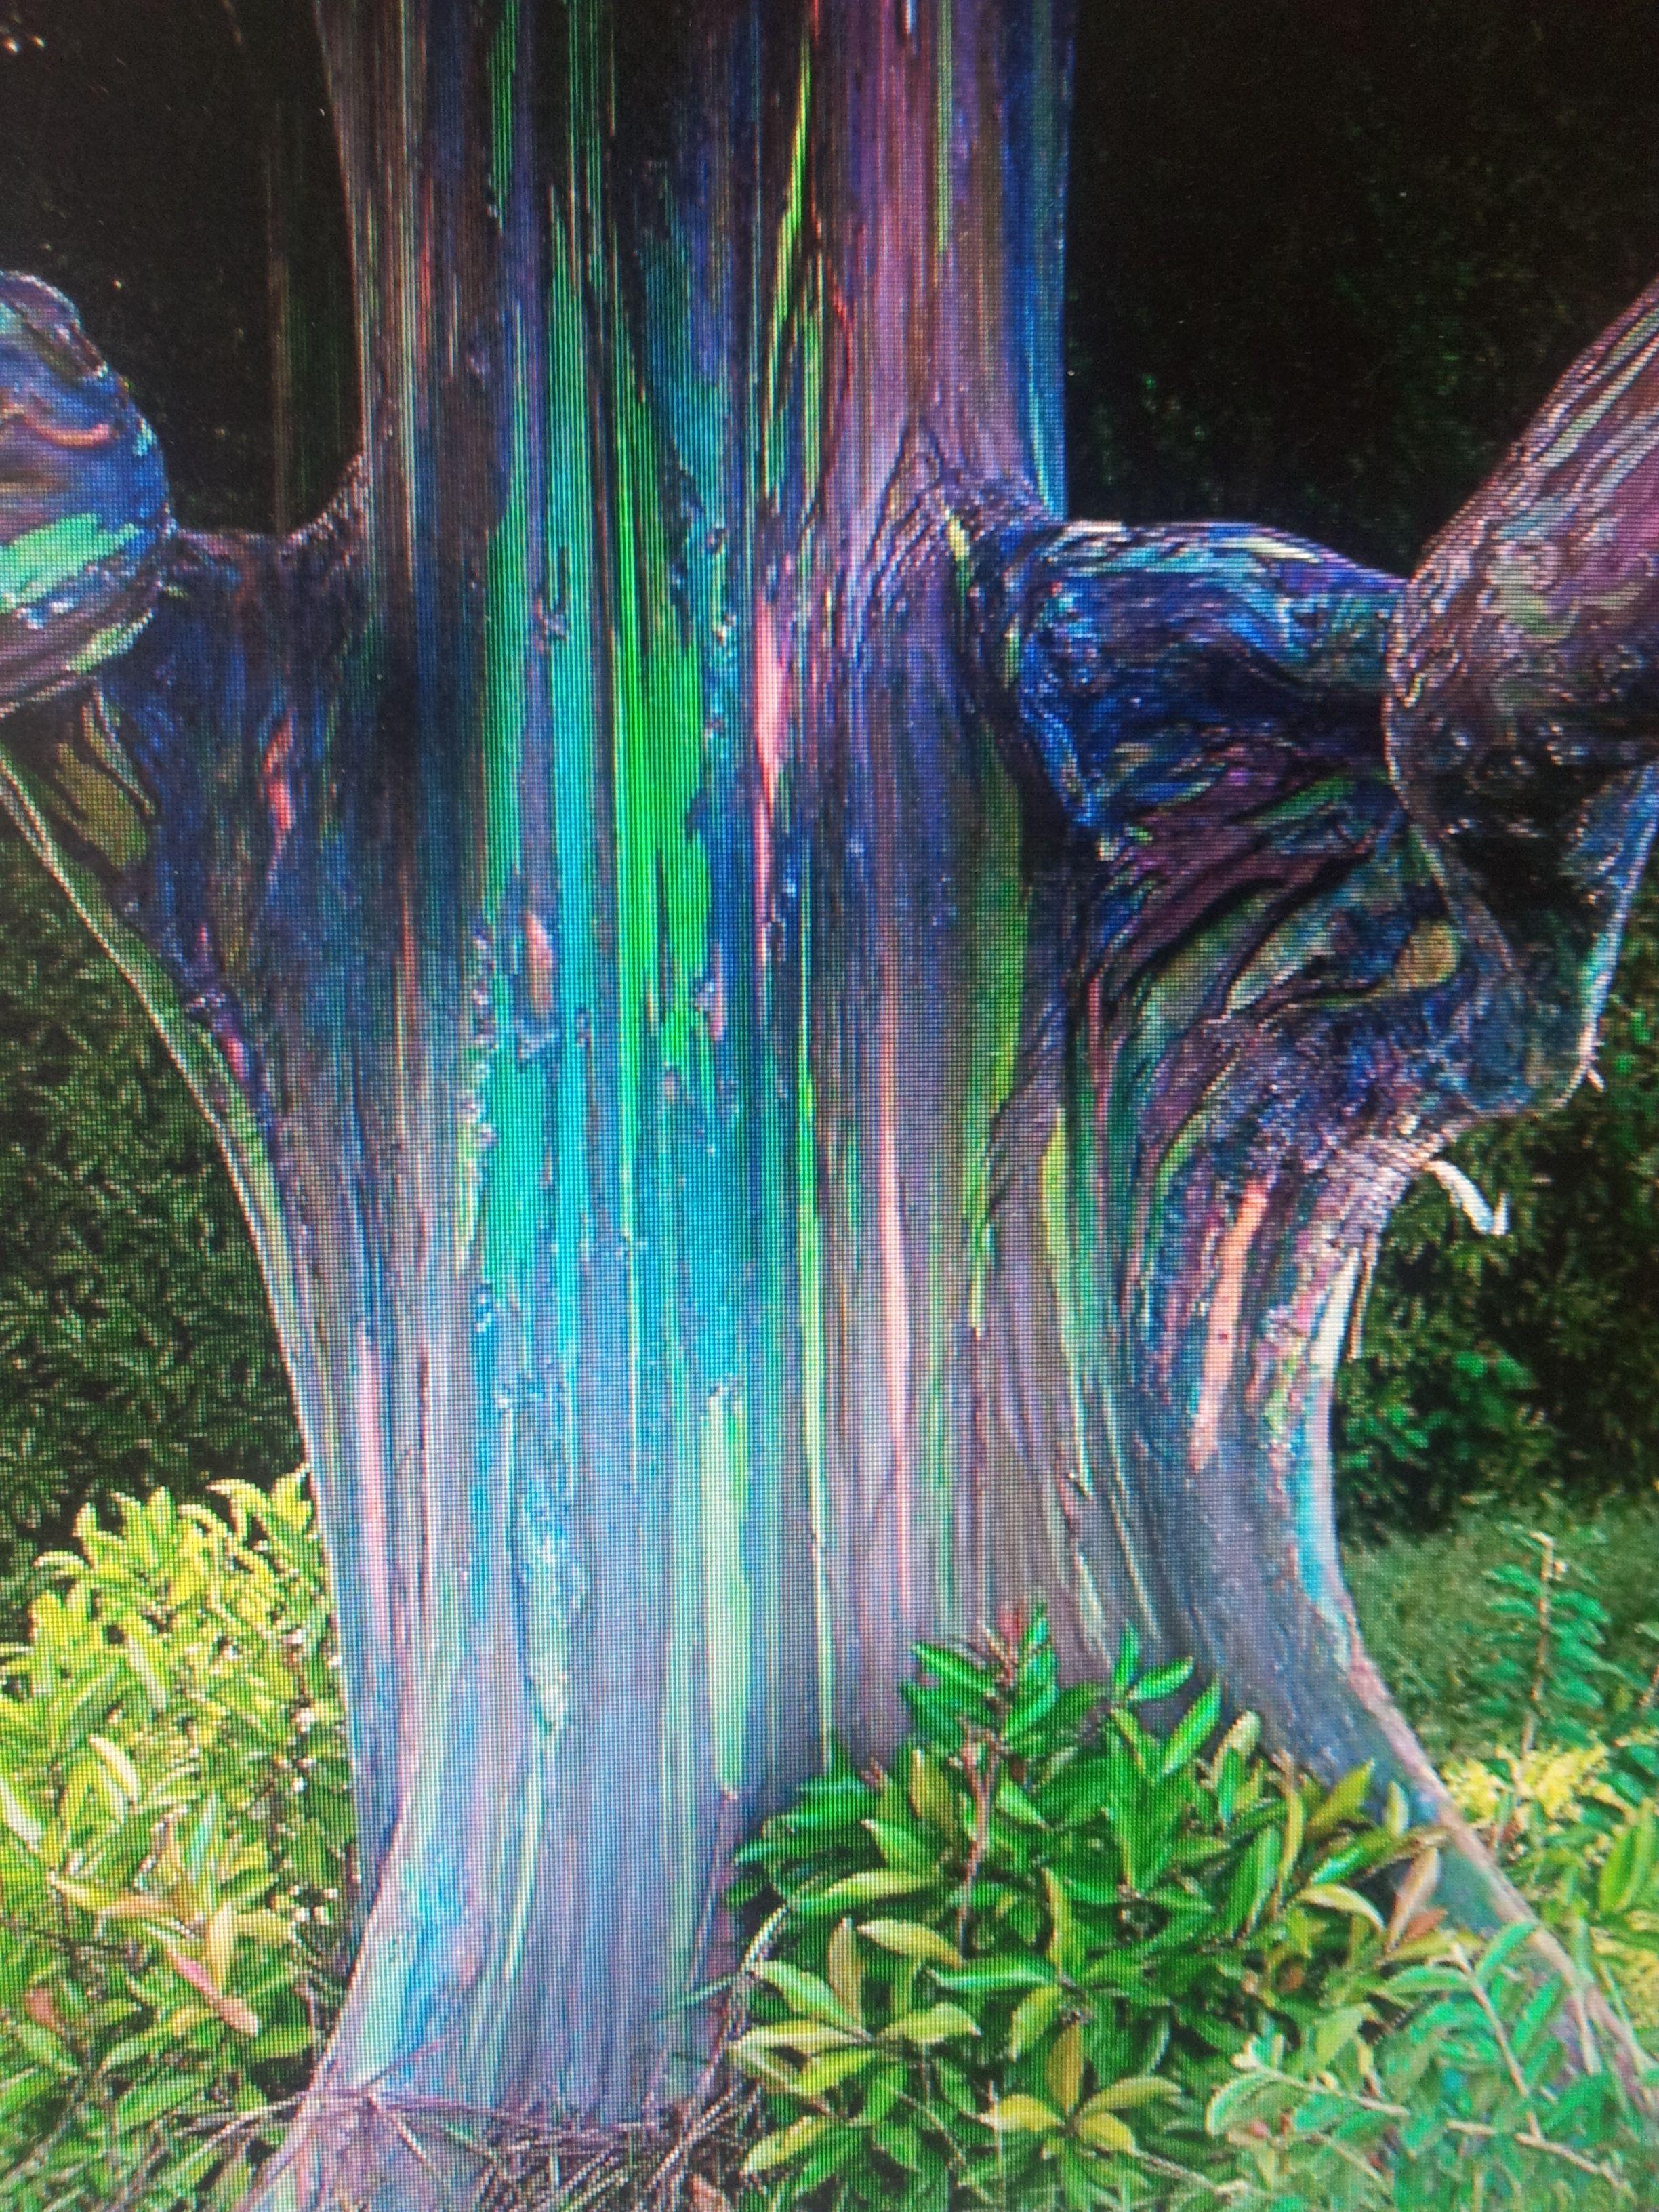 Rainbow Eucalyptus Trees With Videos Rainbow Eucalyptus Tree Rainbow Eucalyptus Rainbow Tree